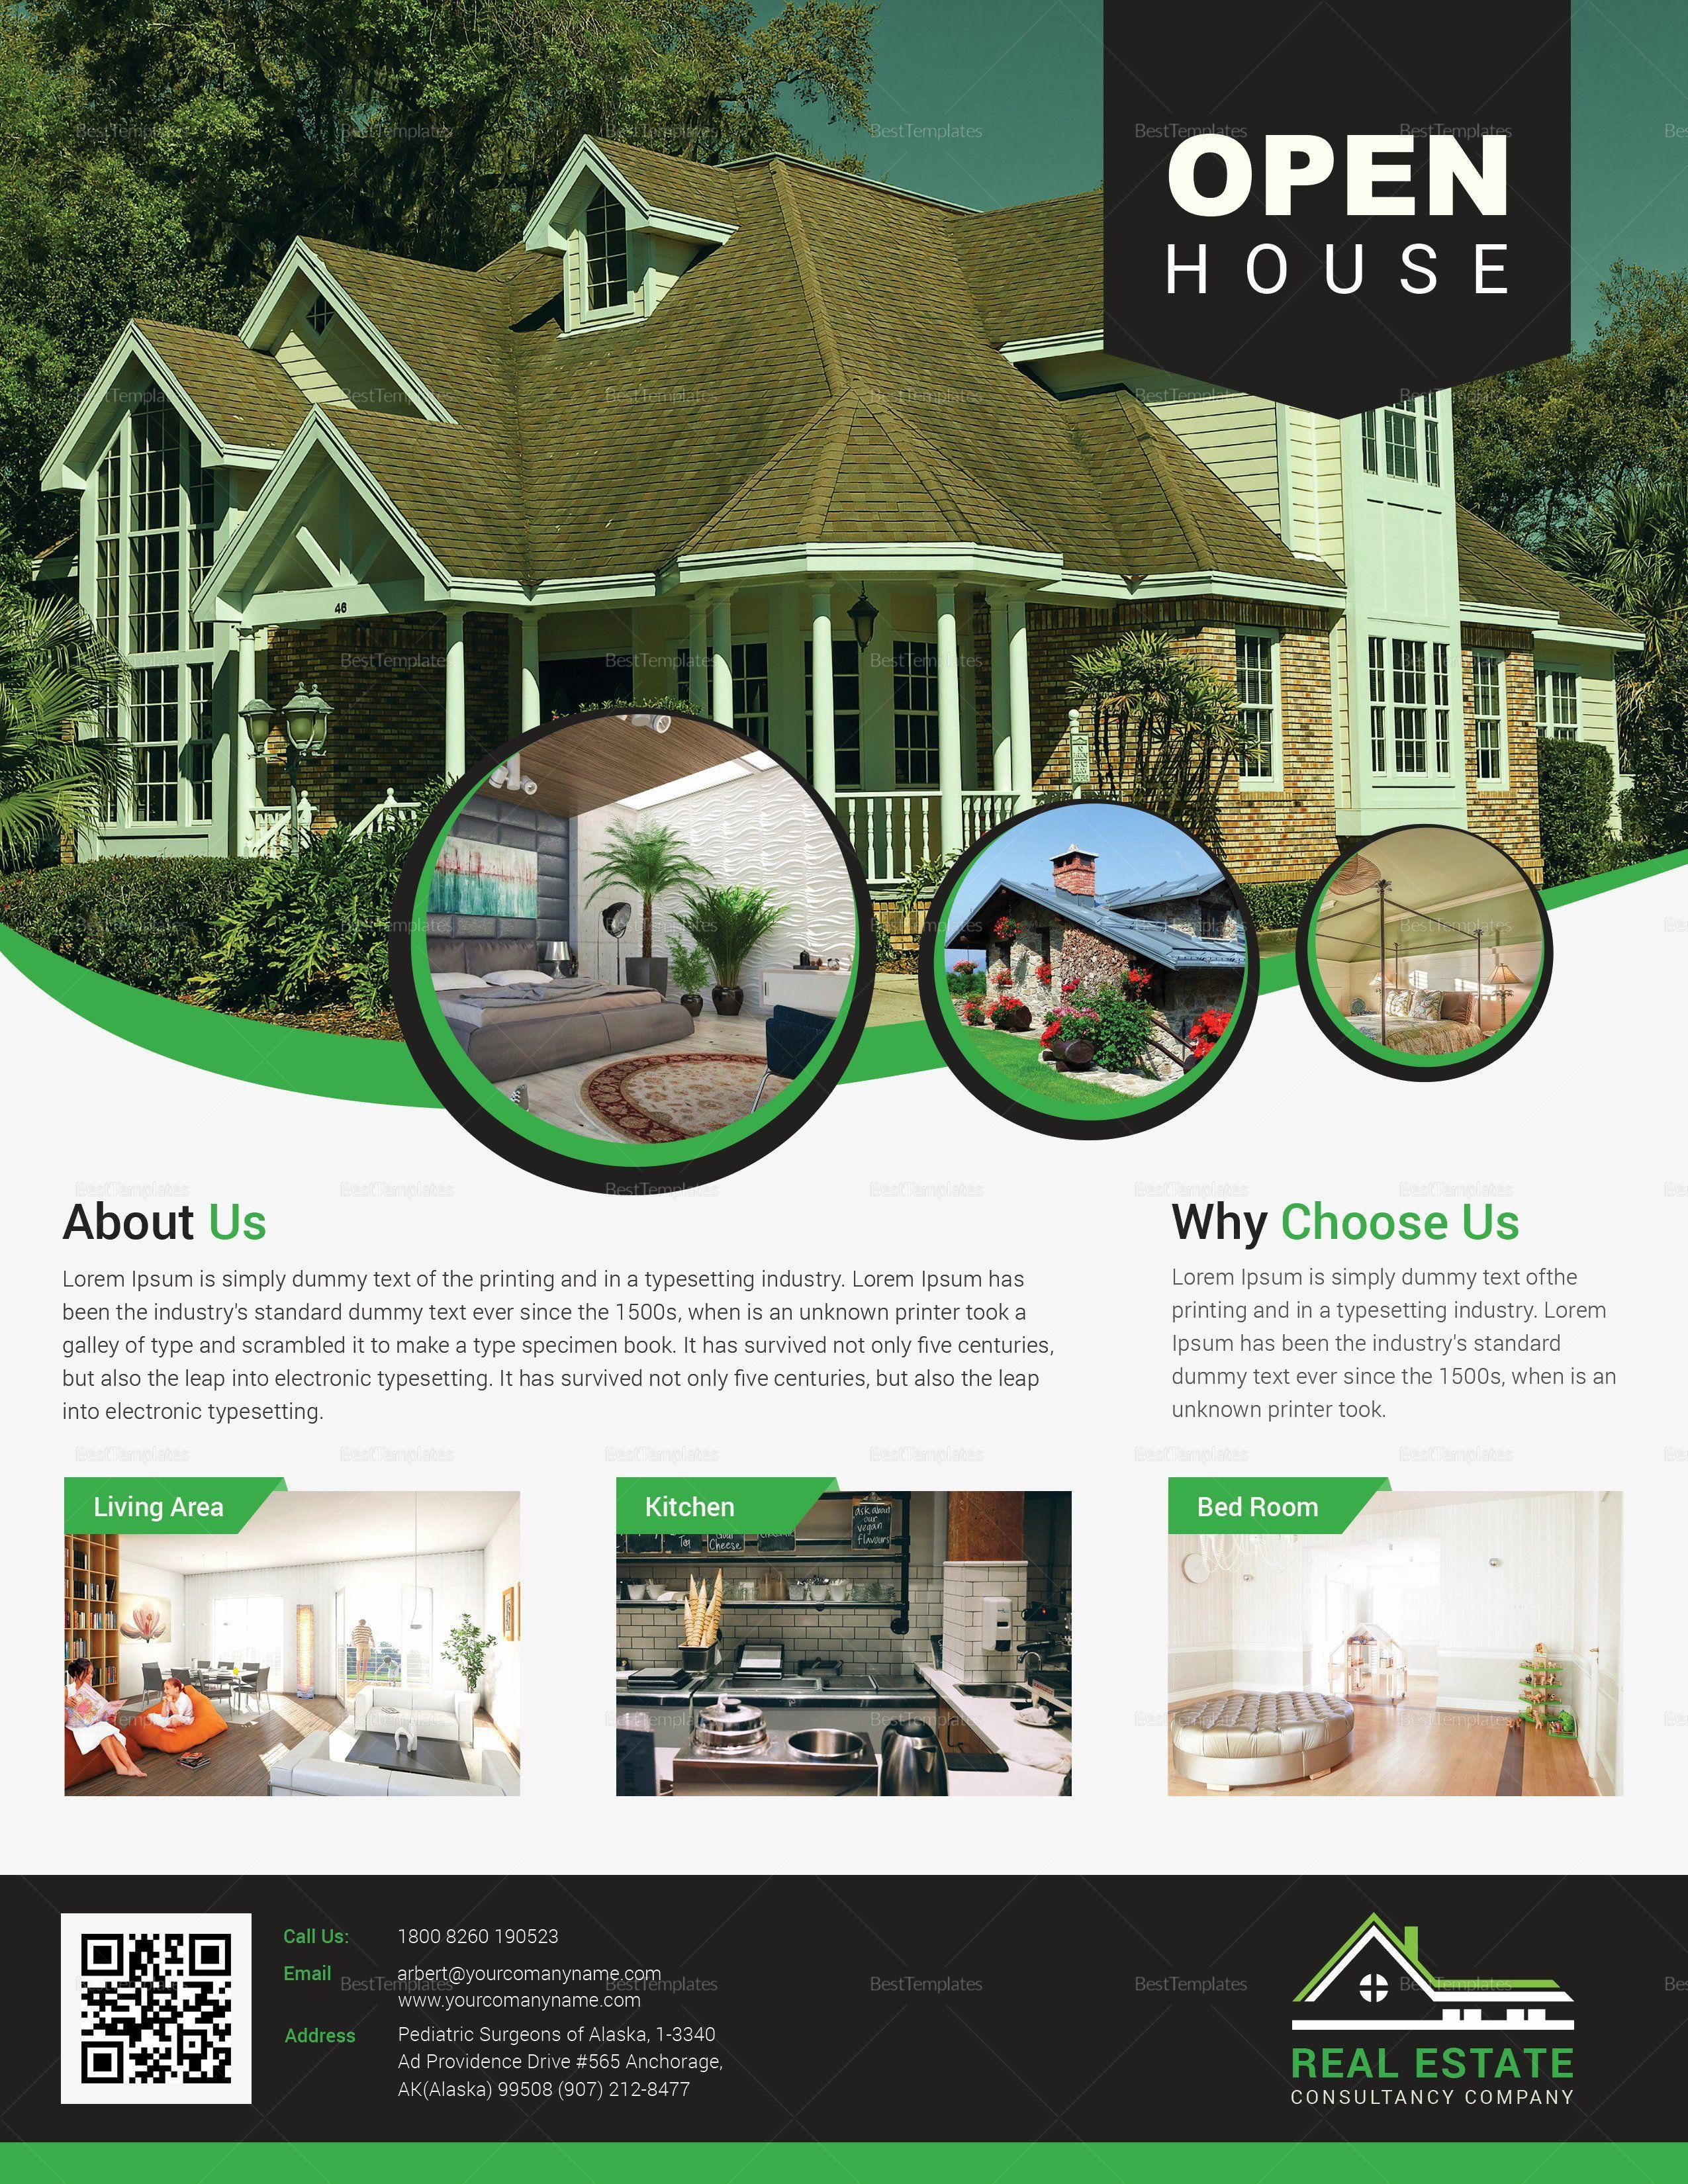 000 Astounding Open House Flyer Template Free Picture  School Microsoft Word PreschoolFull